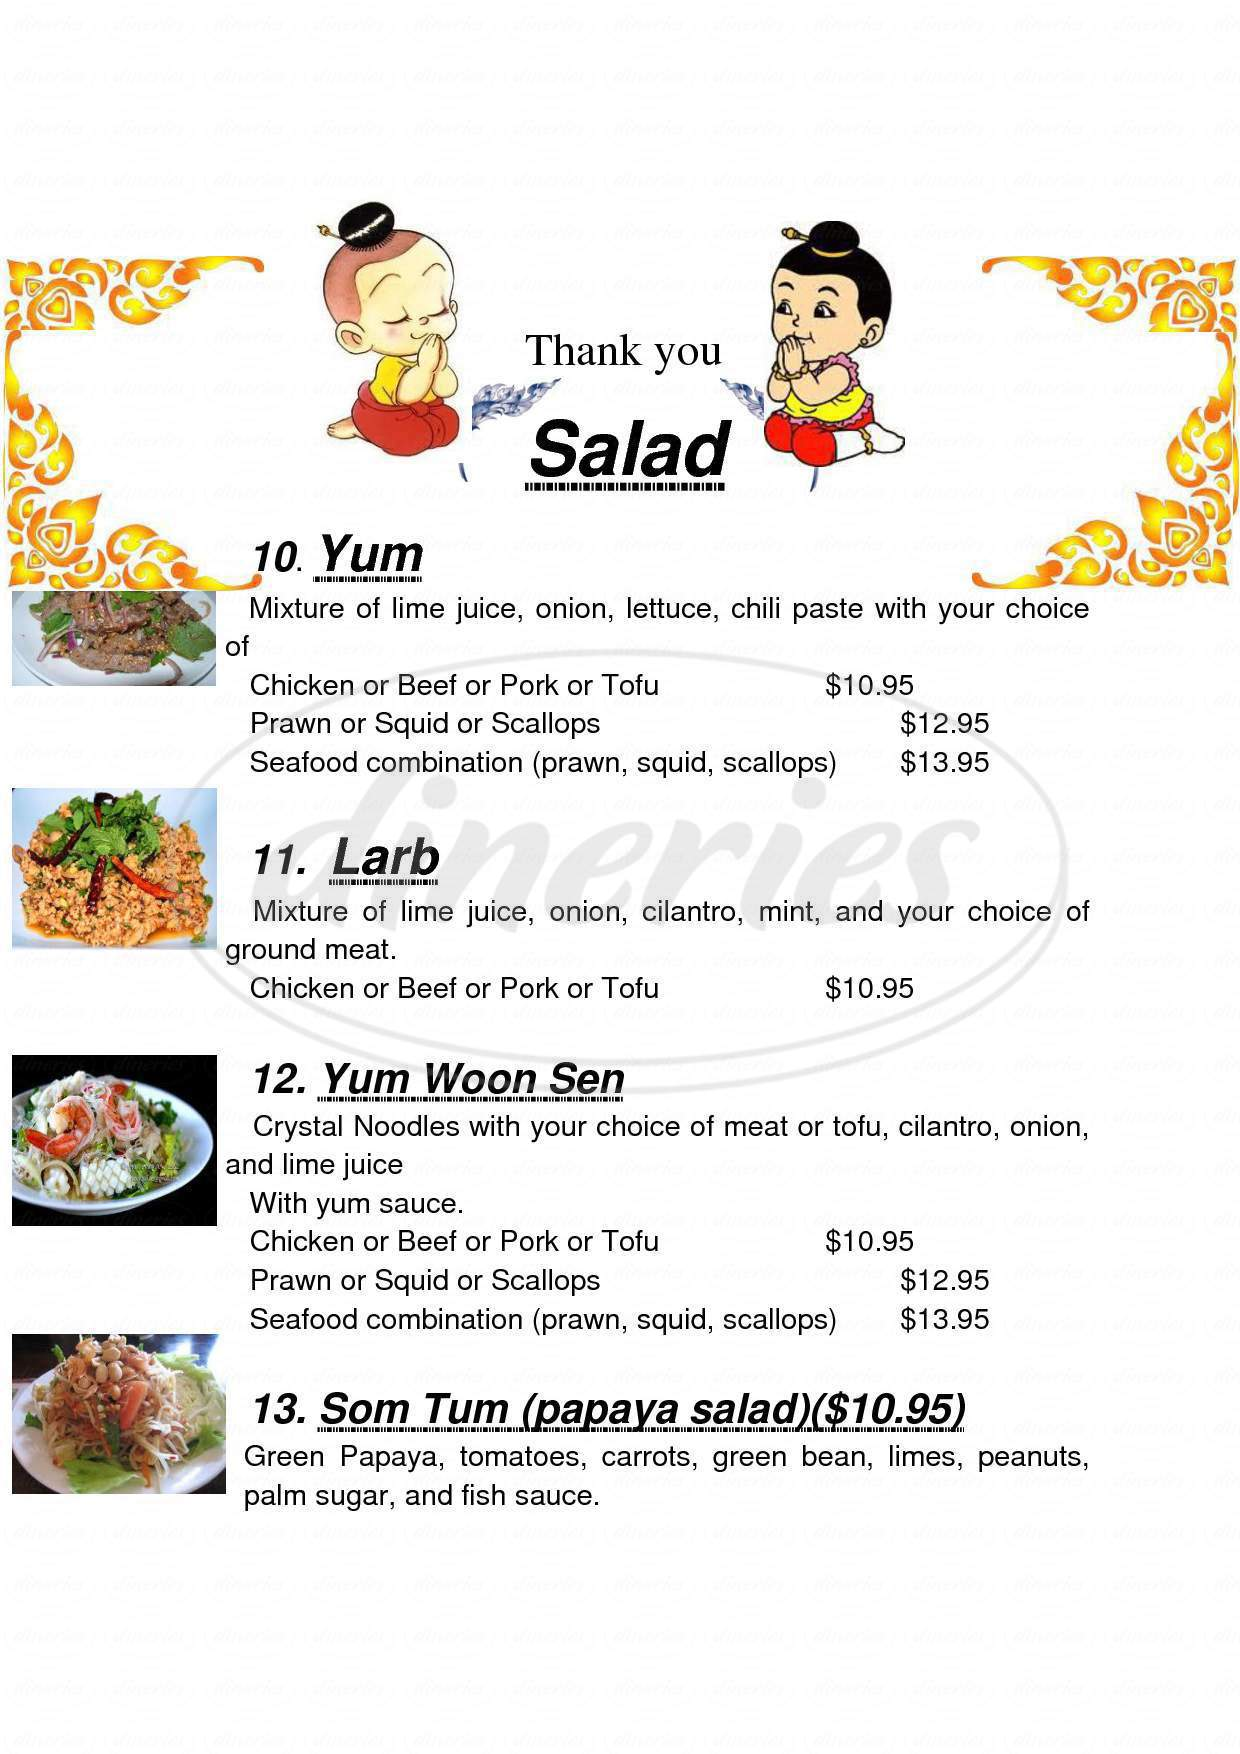 menu for Lawan's Thai Garden